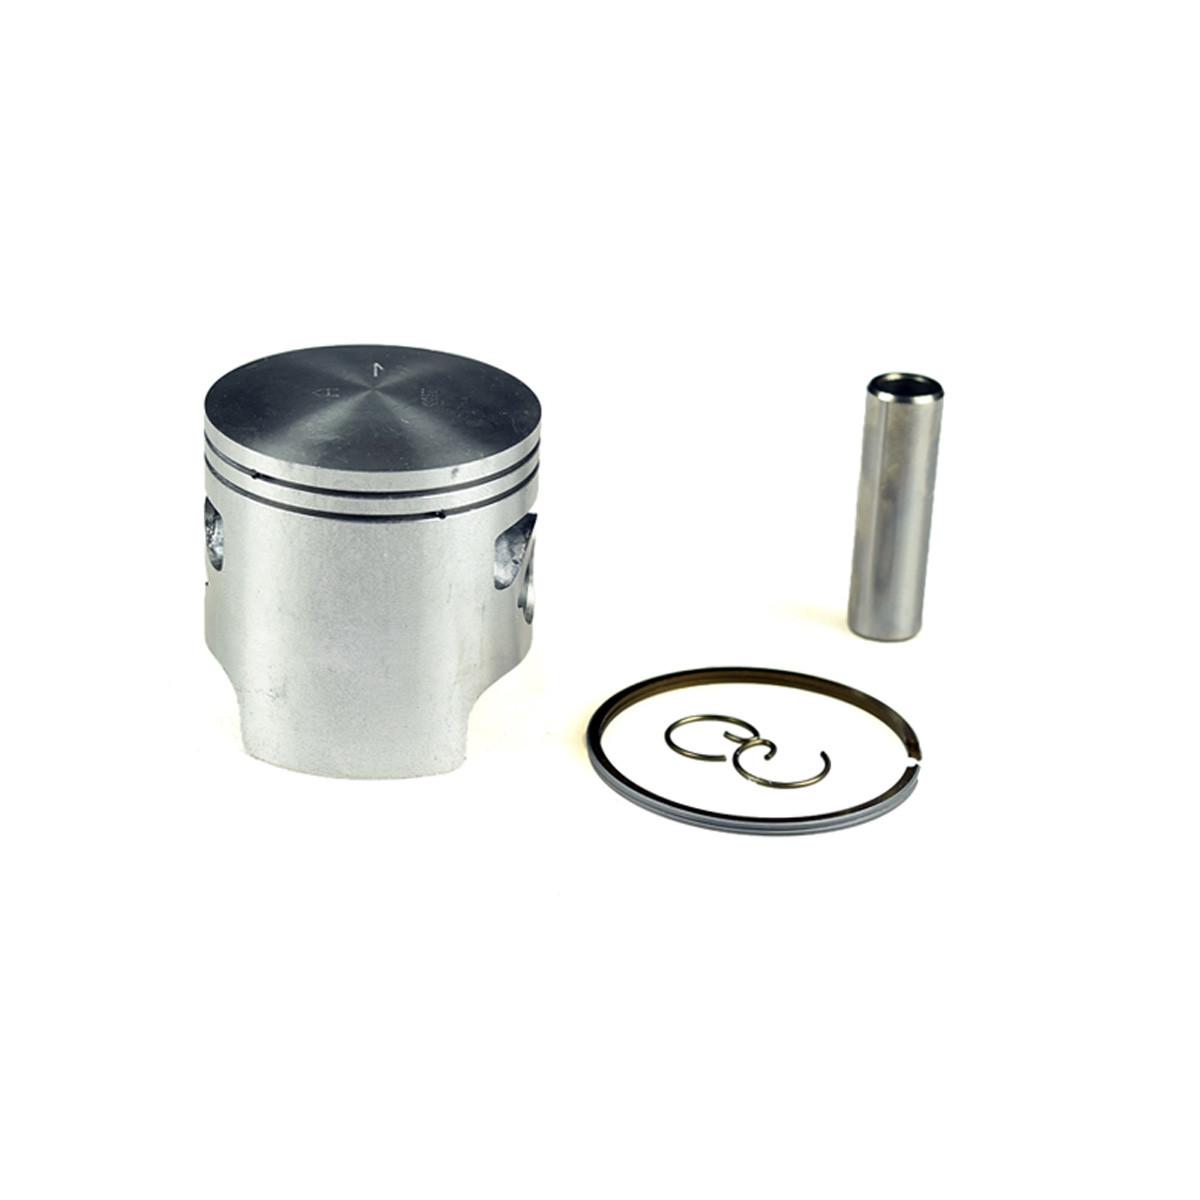 Piston HONDA Vision Scoopy D.48mm à 49.5mm - BARIKIT